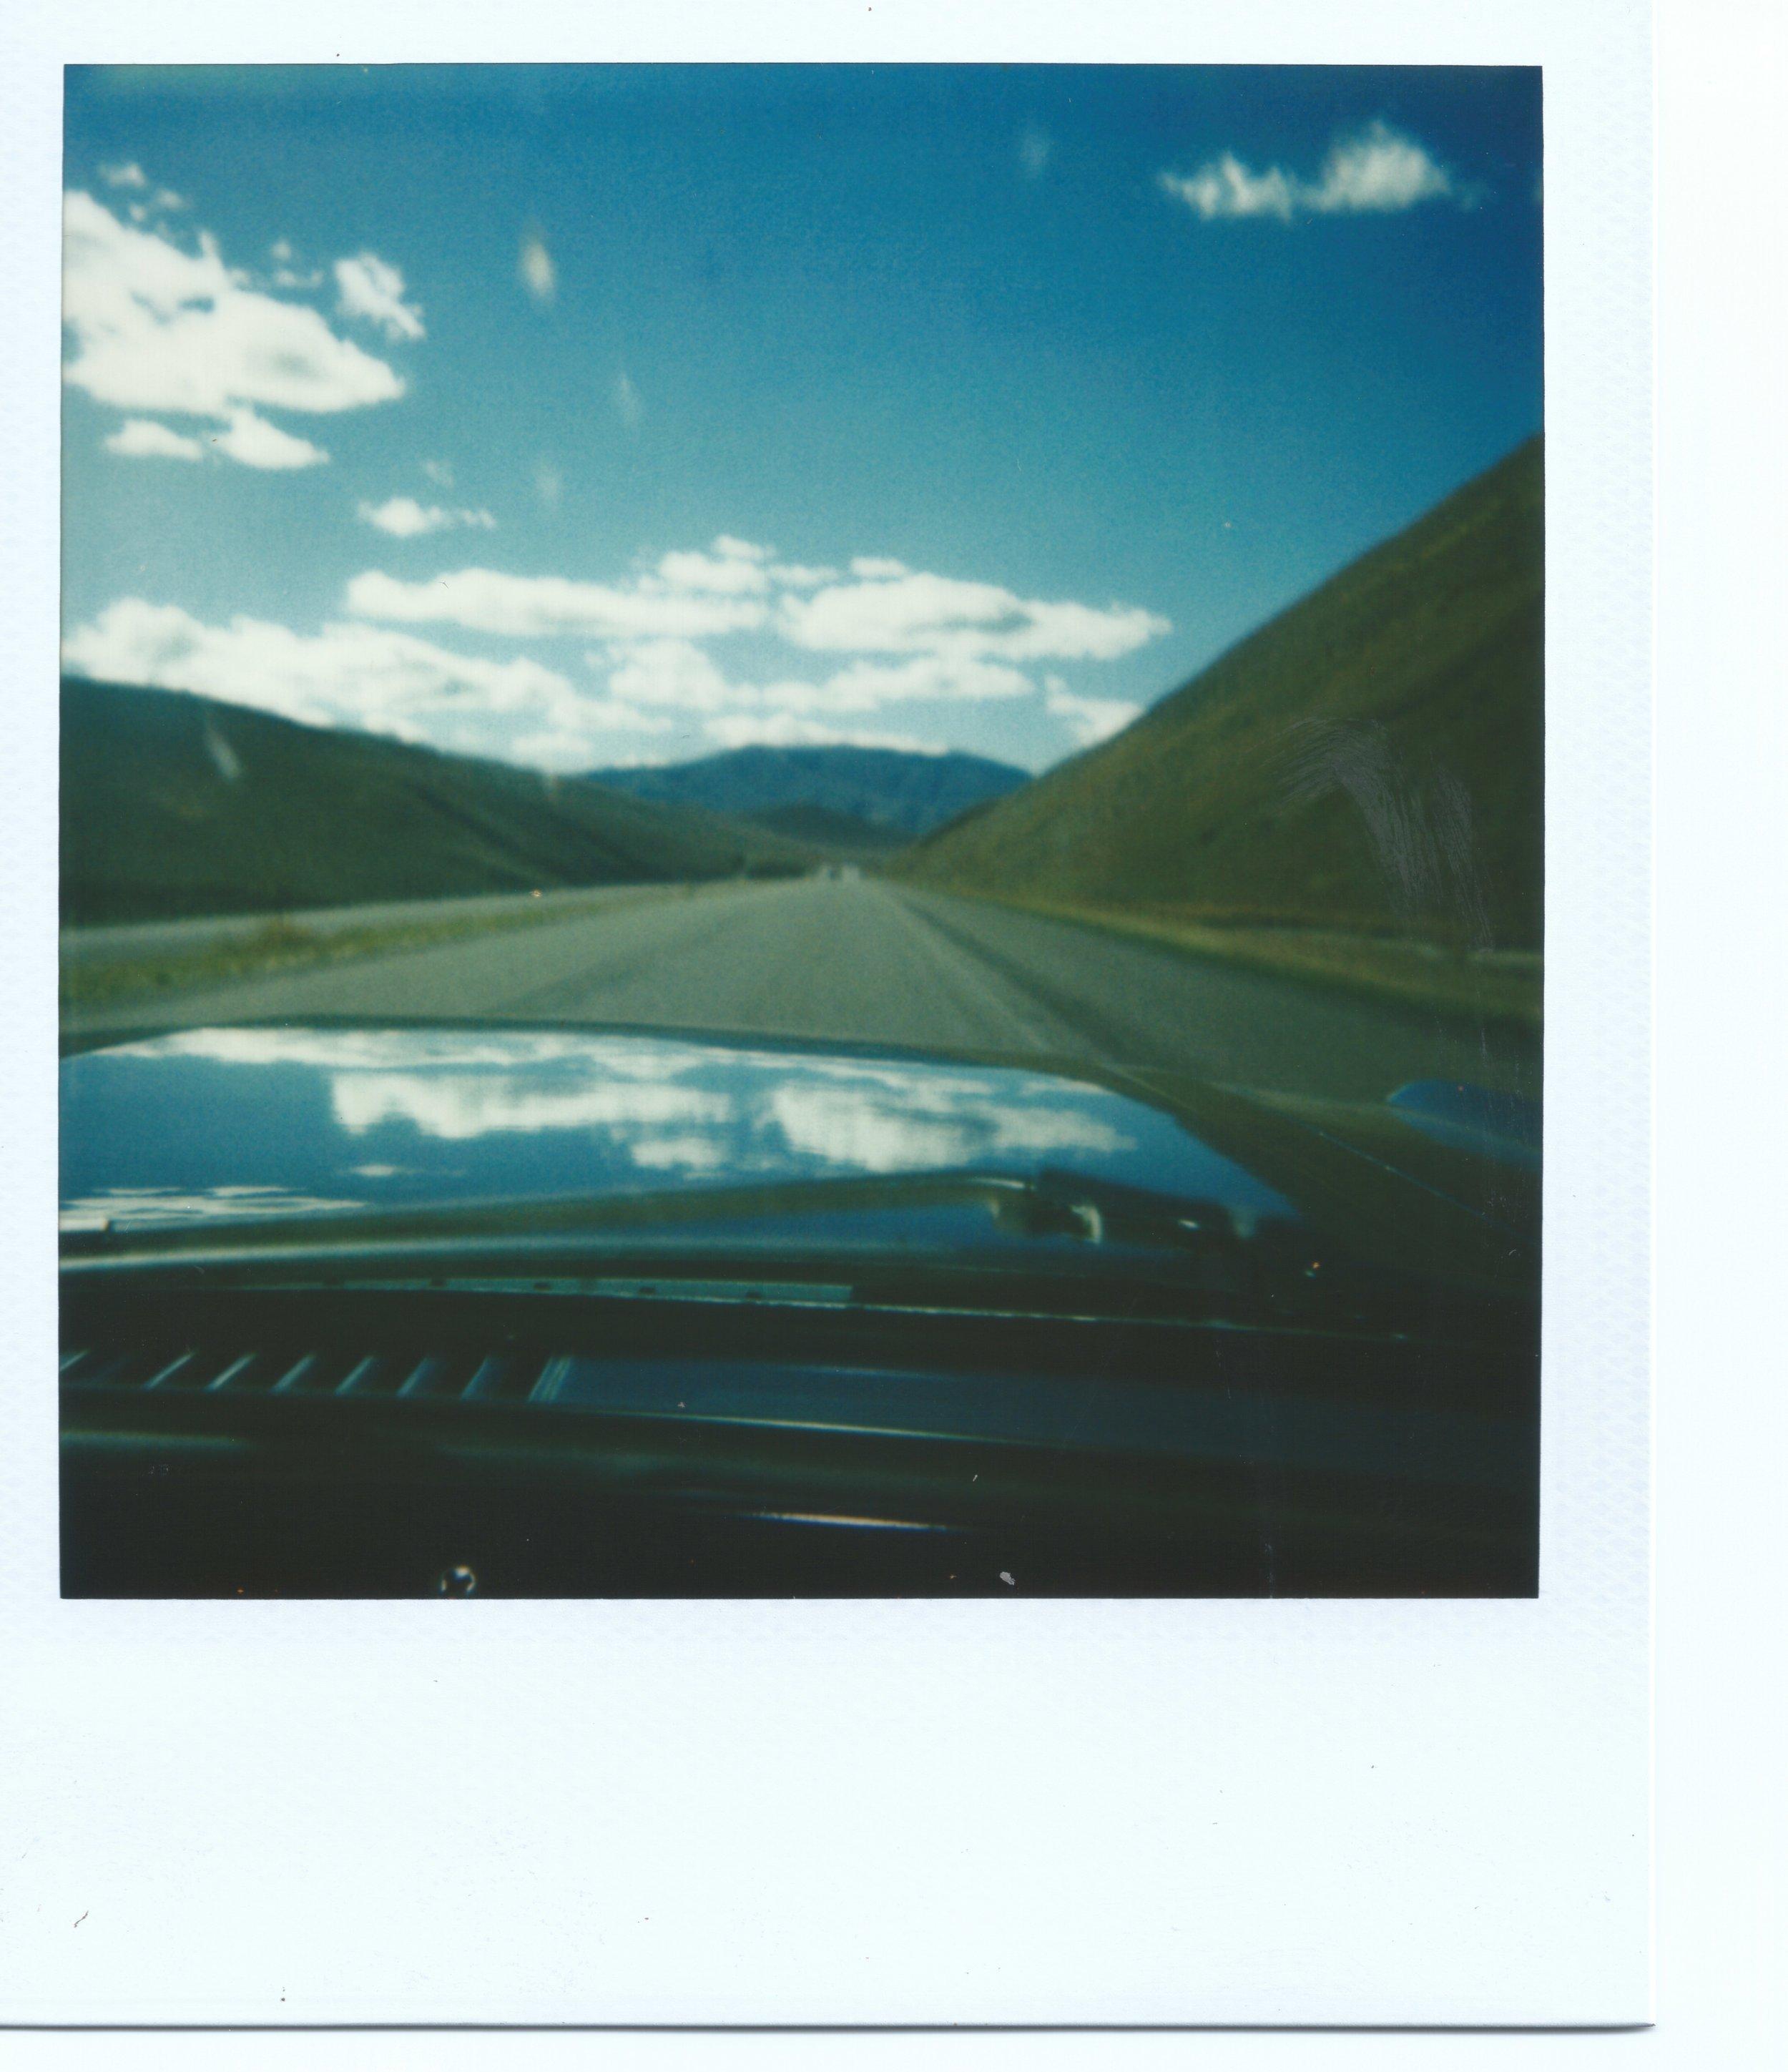 Road_carhood.jpeg